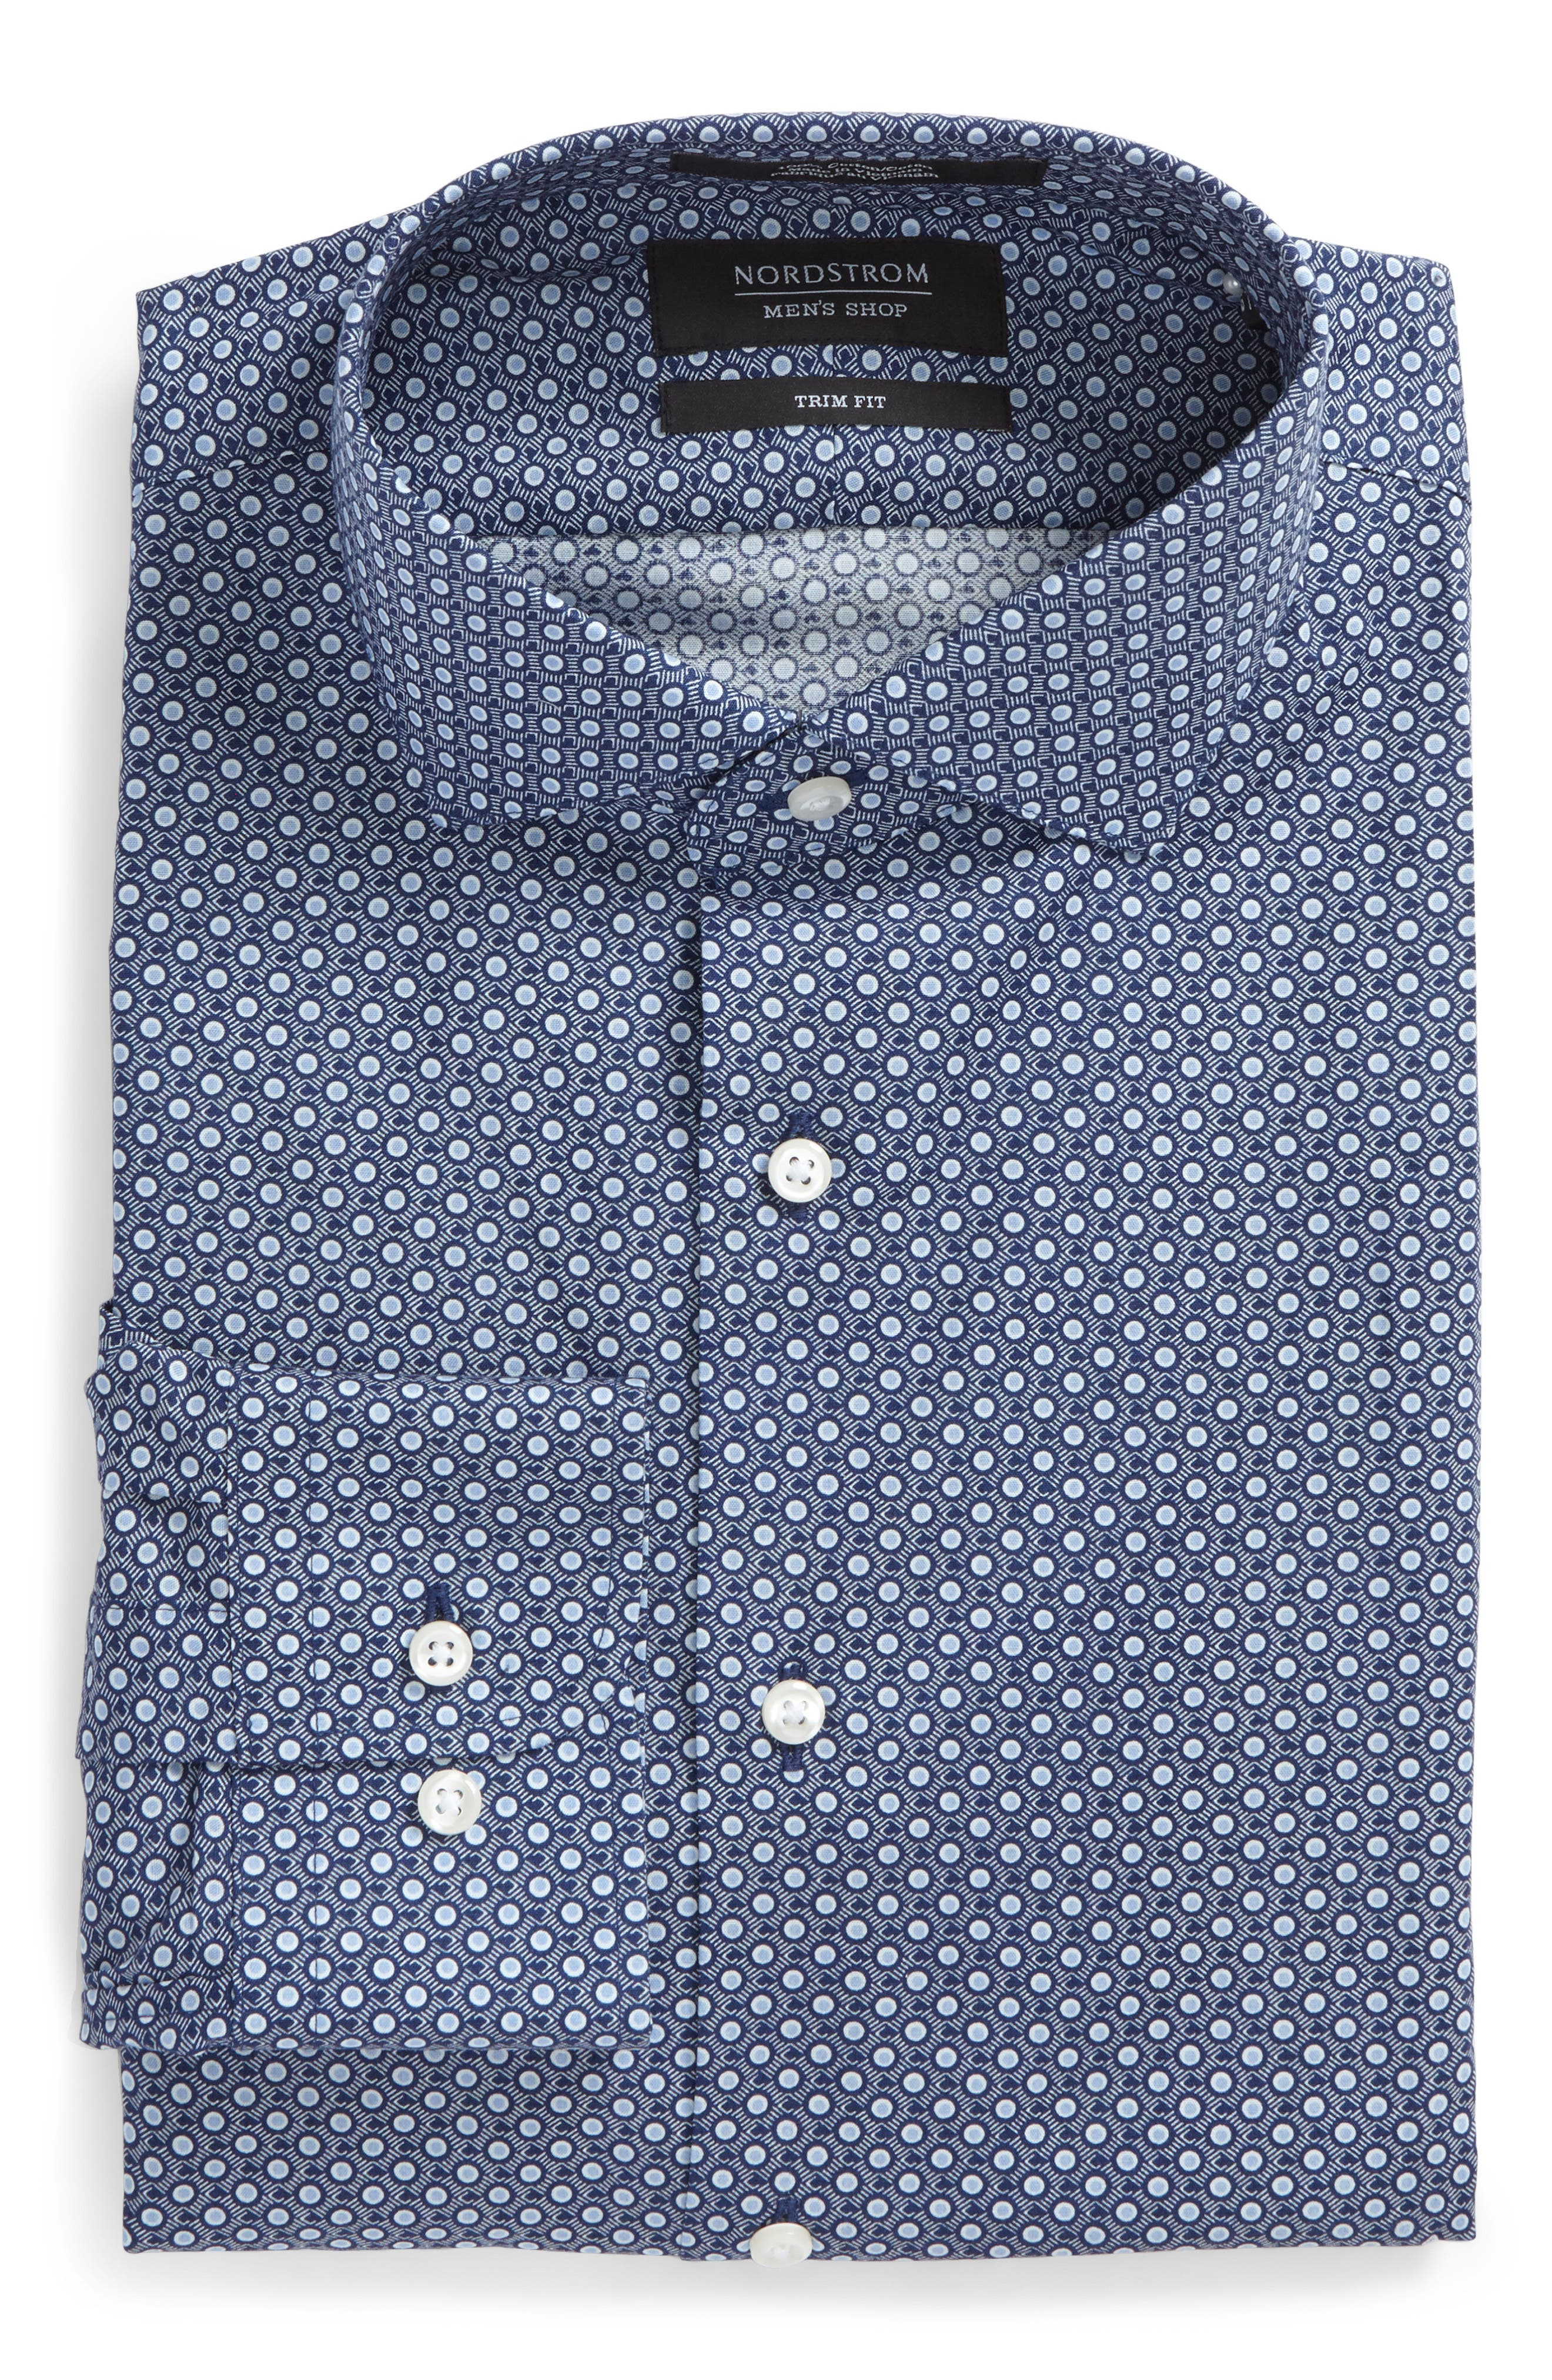 Nordstrom Men's Shop Trim Fit Dress Shirt